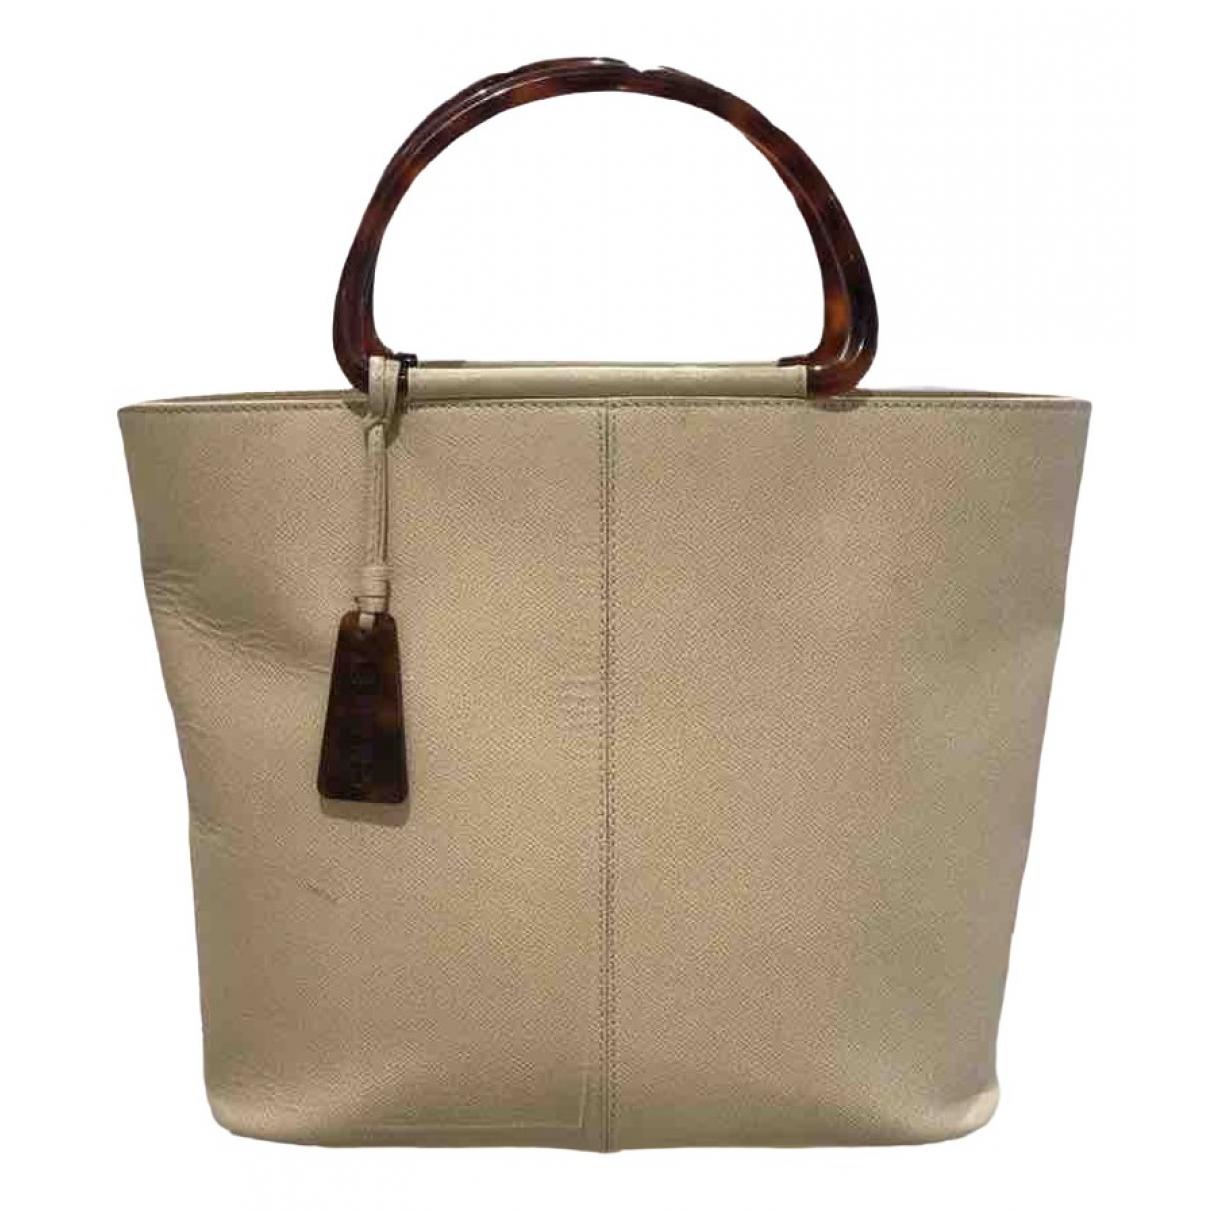 Chanel \N Beige Leather handbag for Women \N